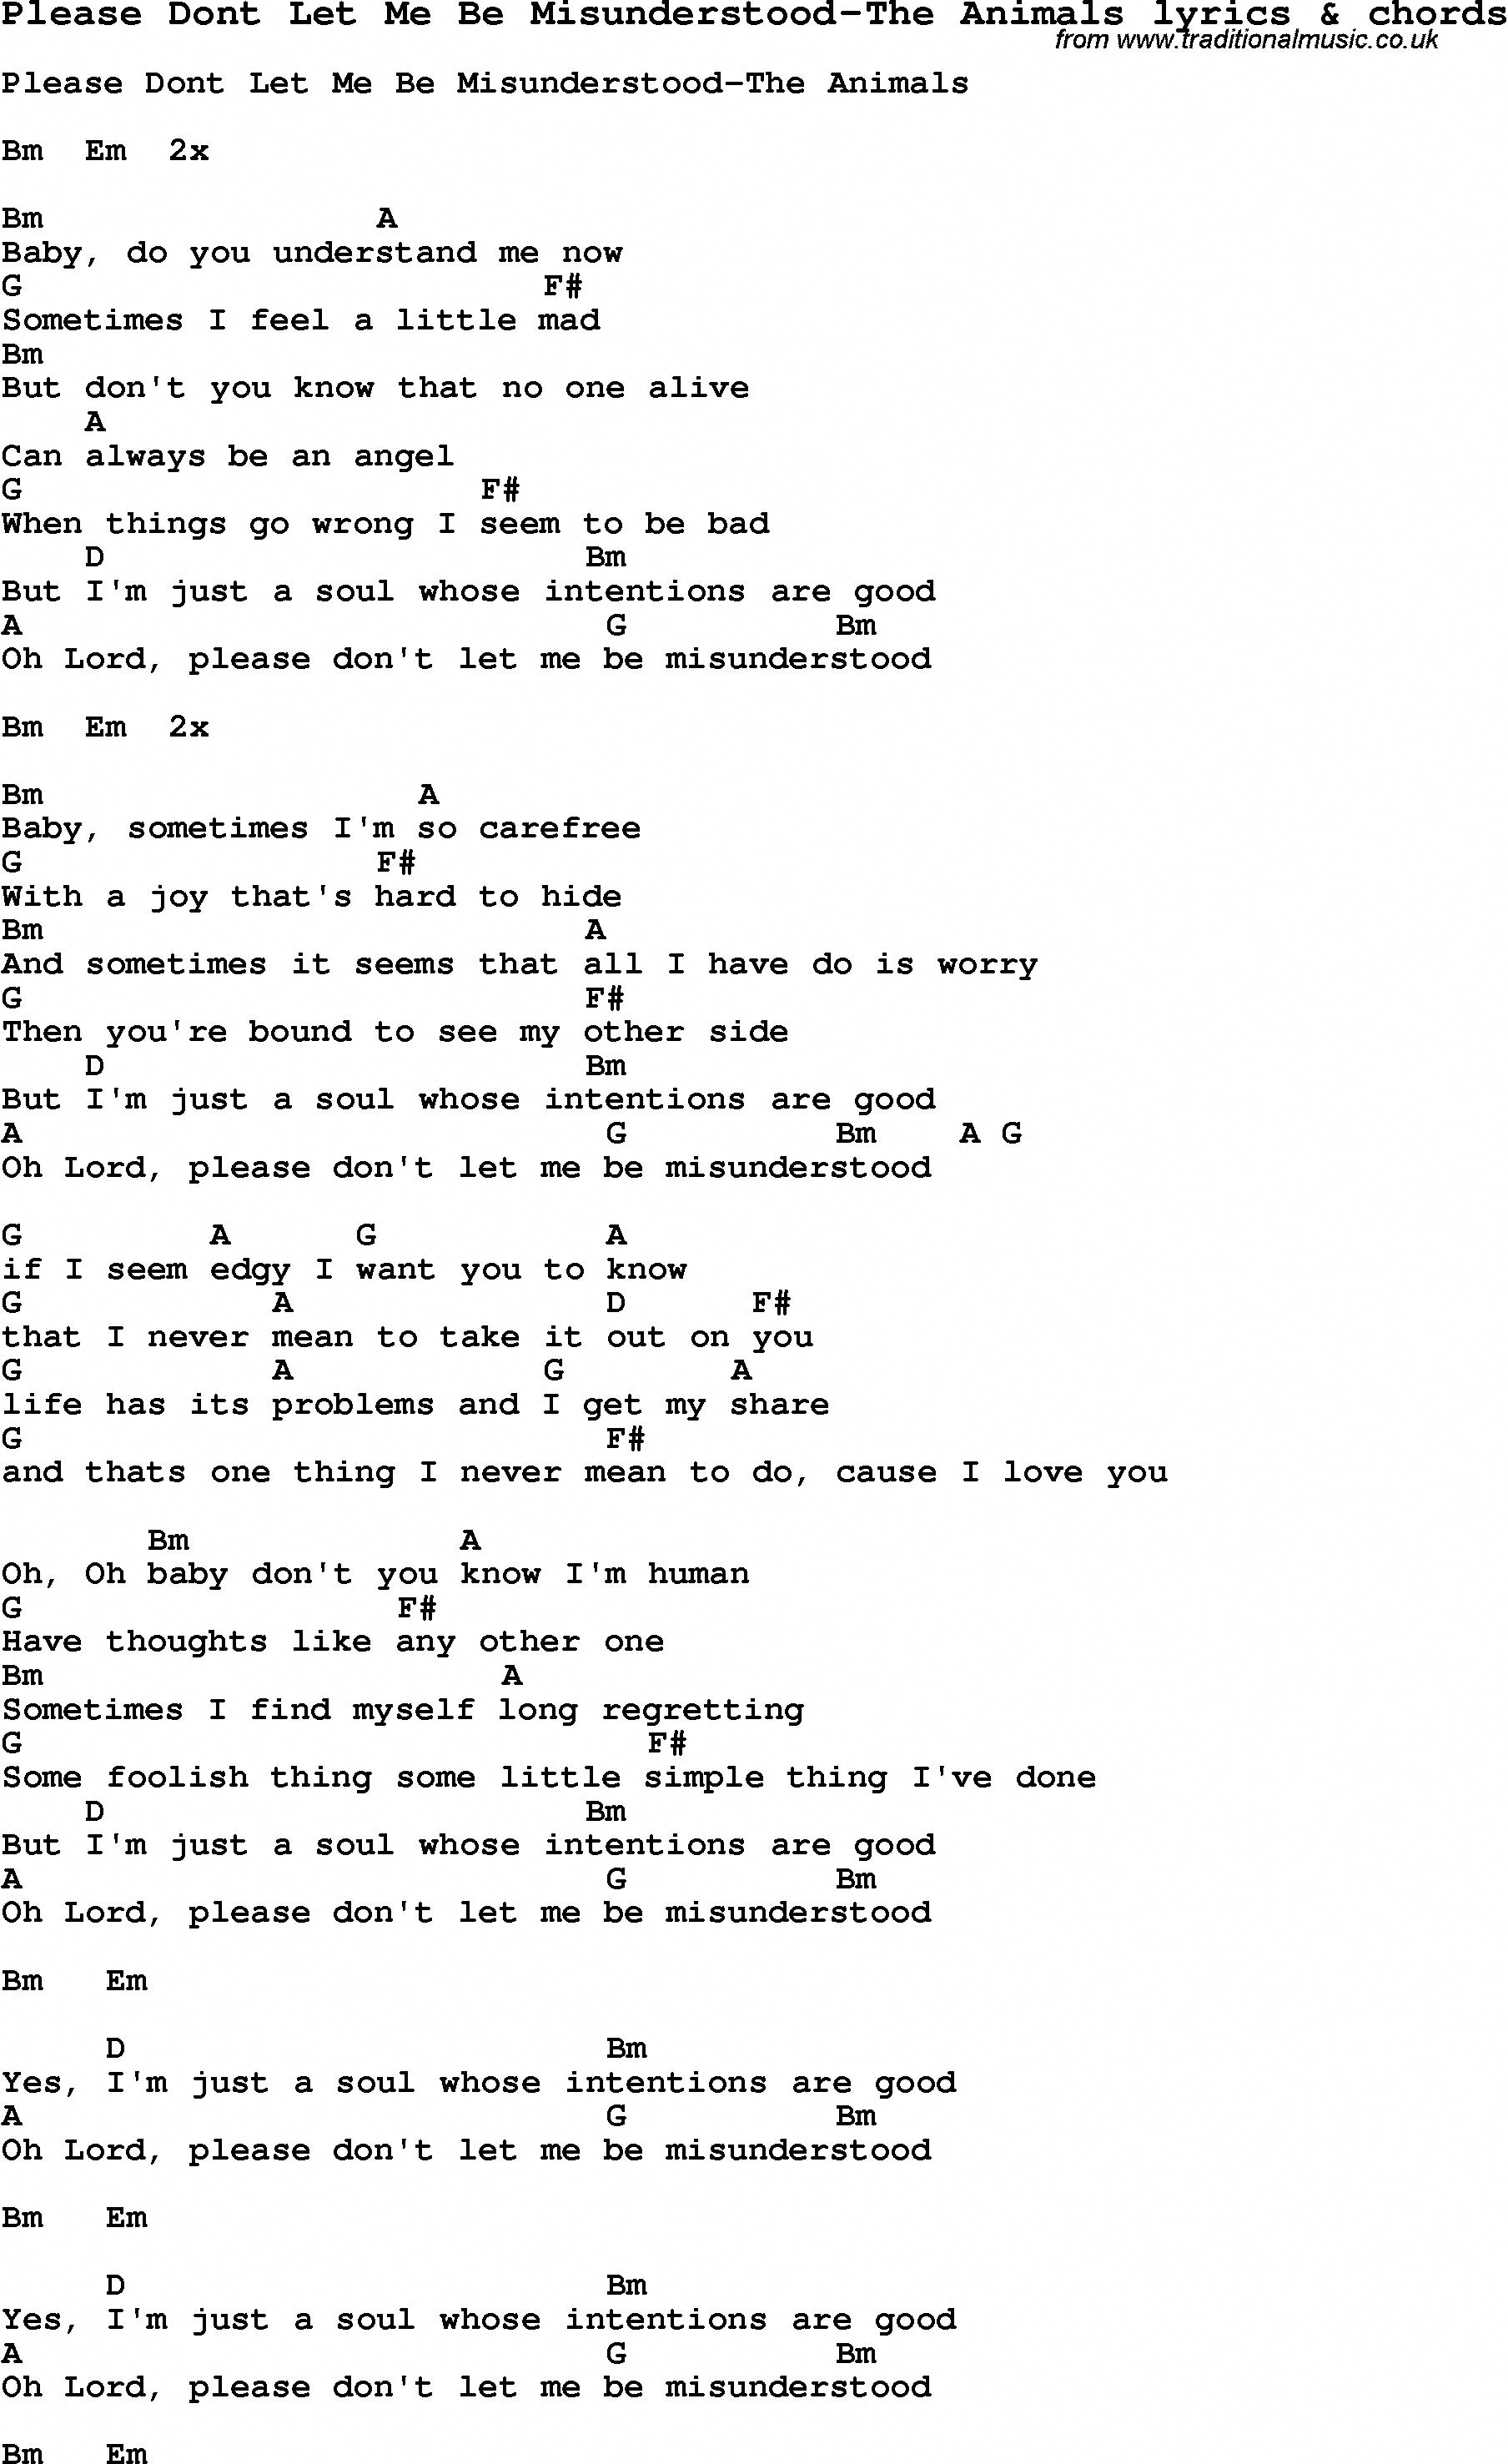 Love Song Lyrics forPlease Dont Let Me Be Misunderstood